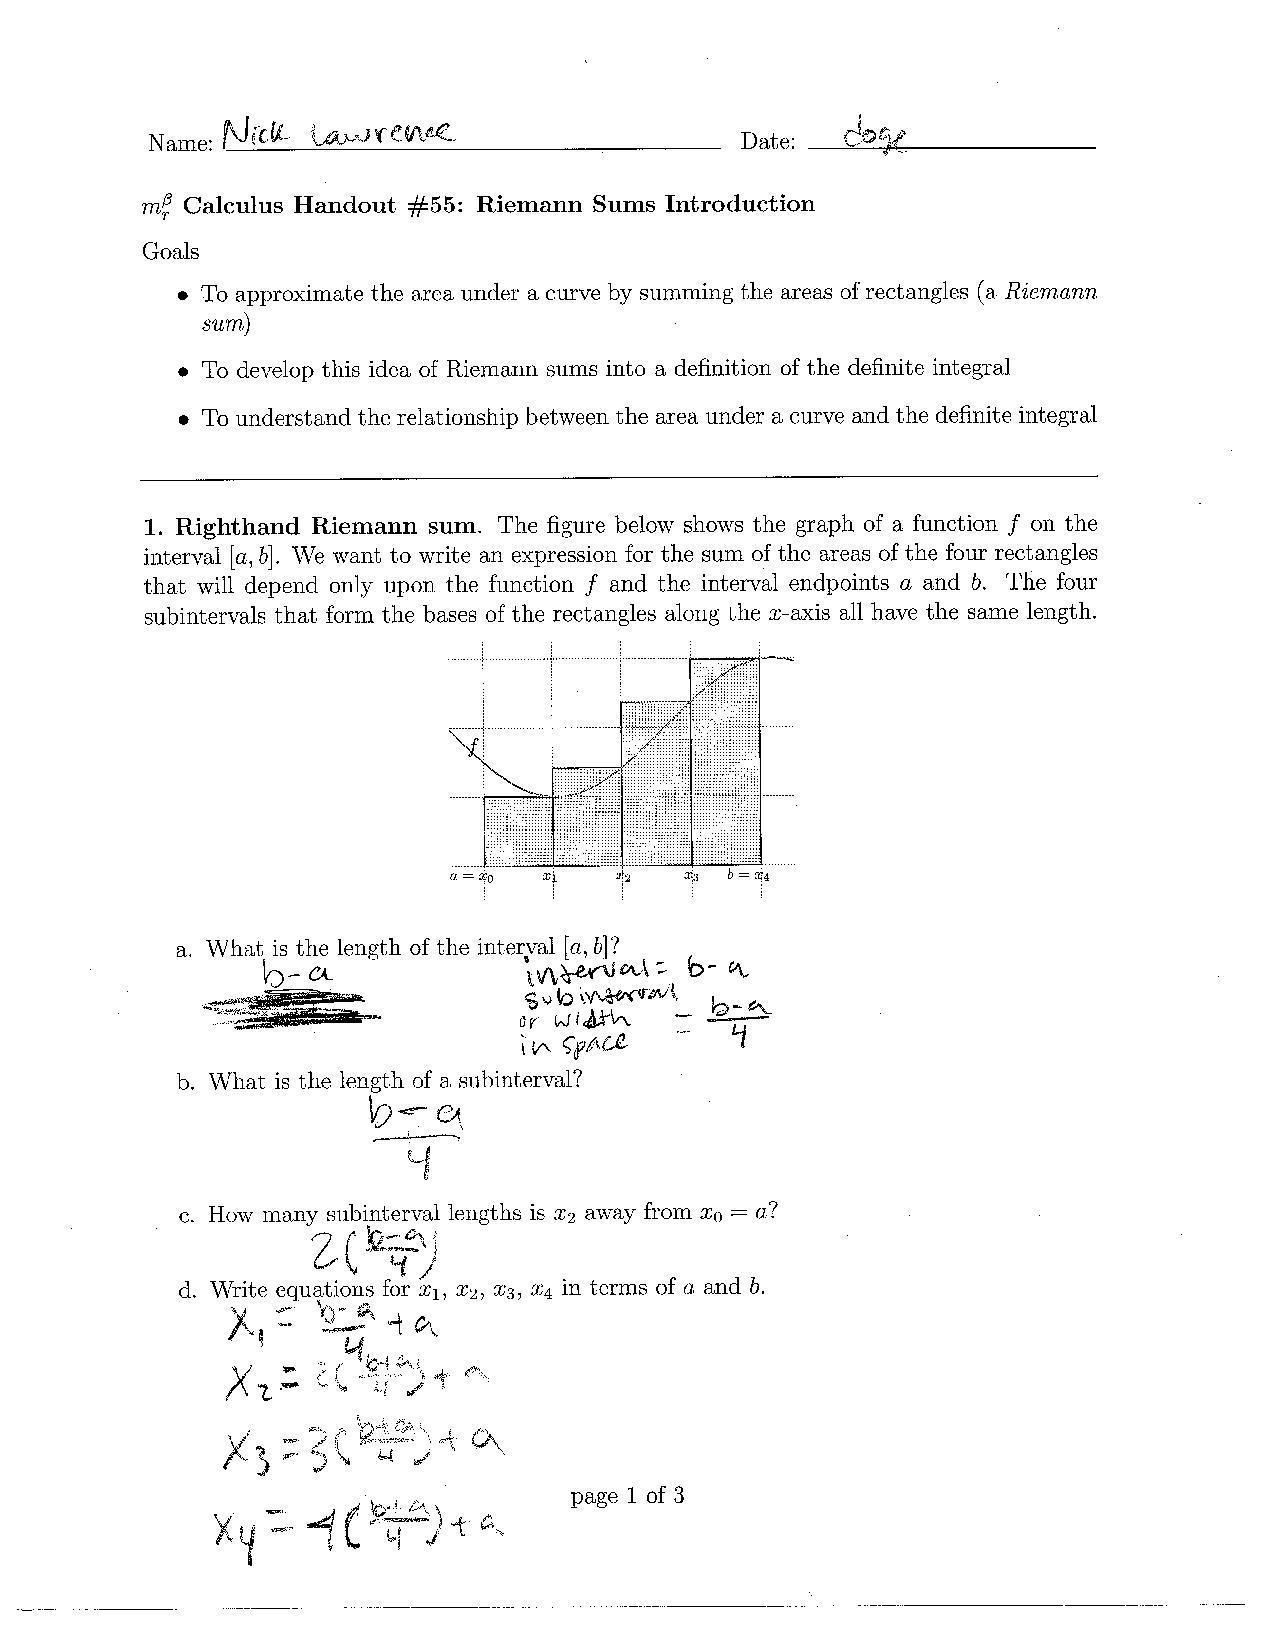 Riemann Sums Nlawrencecalculus